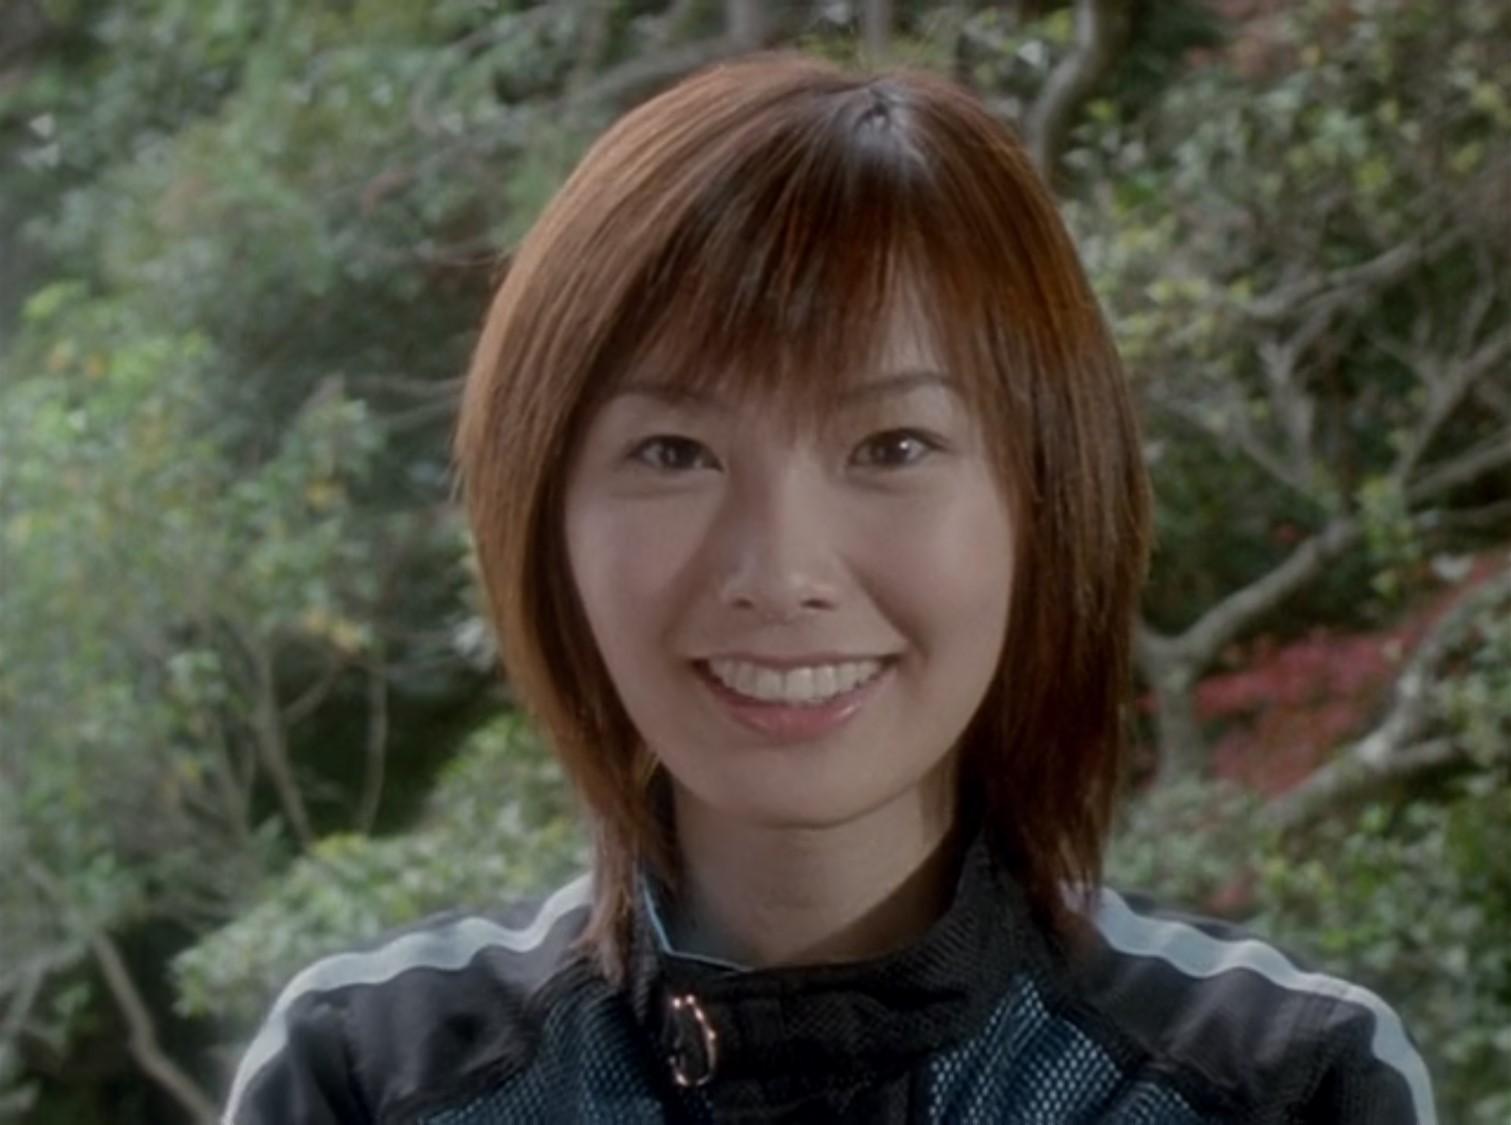 List of Nanami Nono's appearances